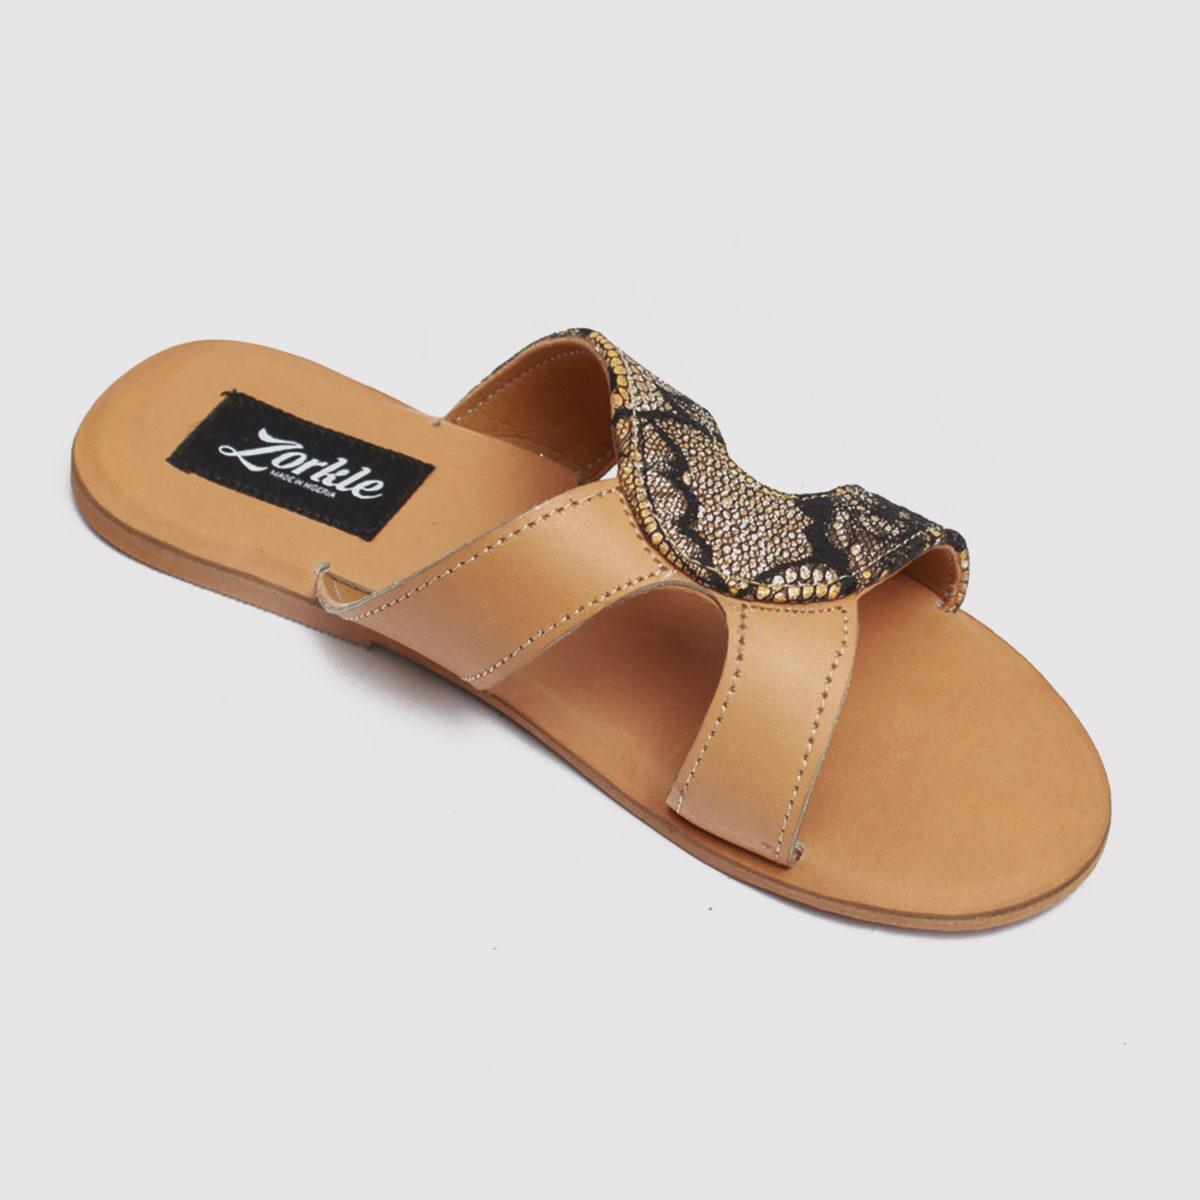 Habi slippers brown satin zorkles shoes in lagos nigeria